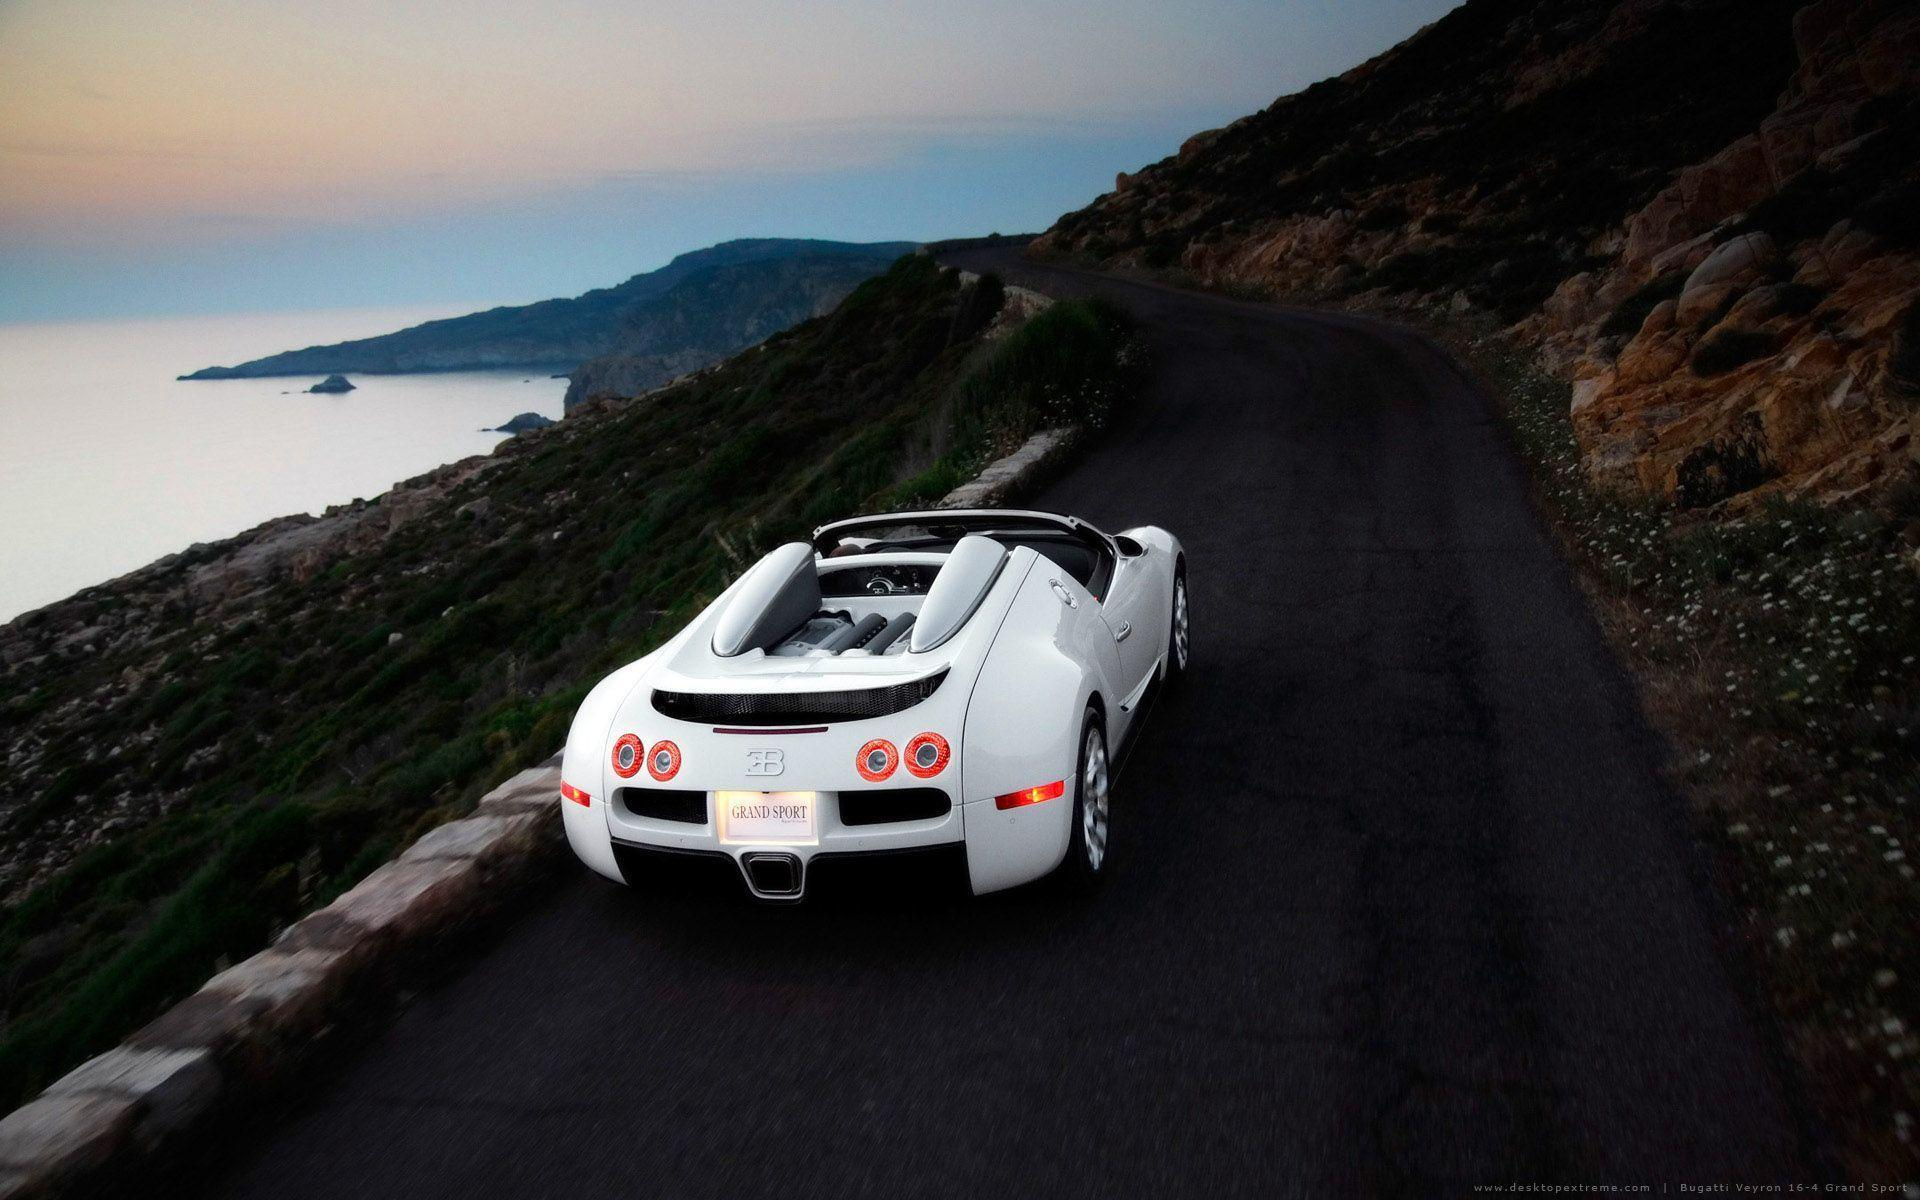 YkG9mMM Astounding Bugatti Veyron Grand Sport Vitesse Hd Cars Trend